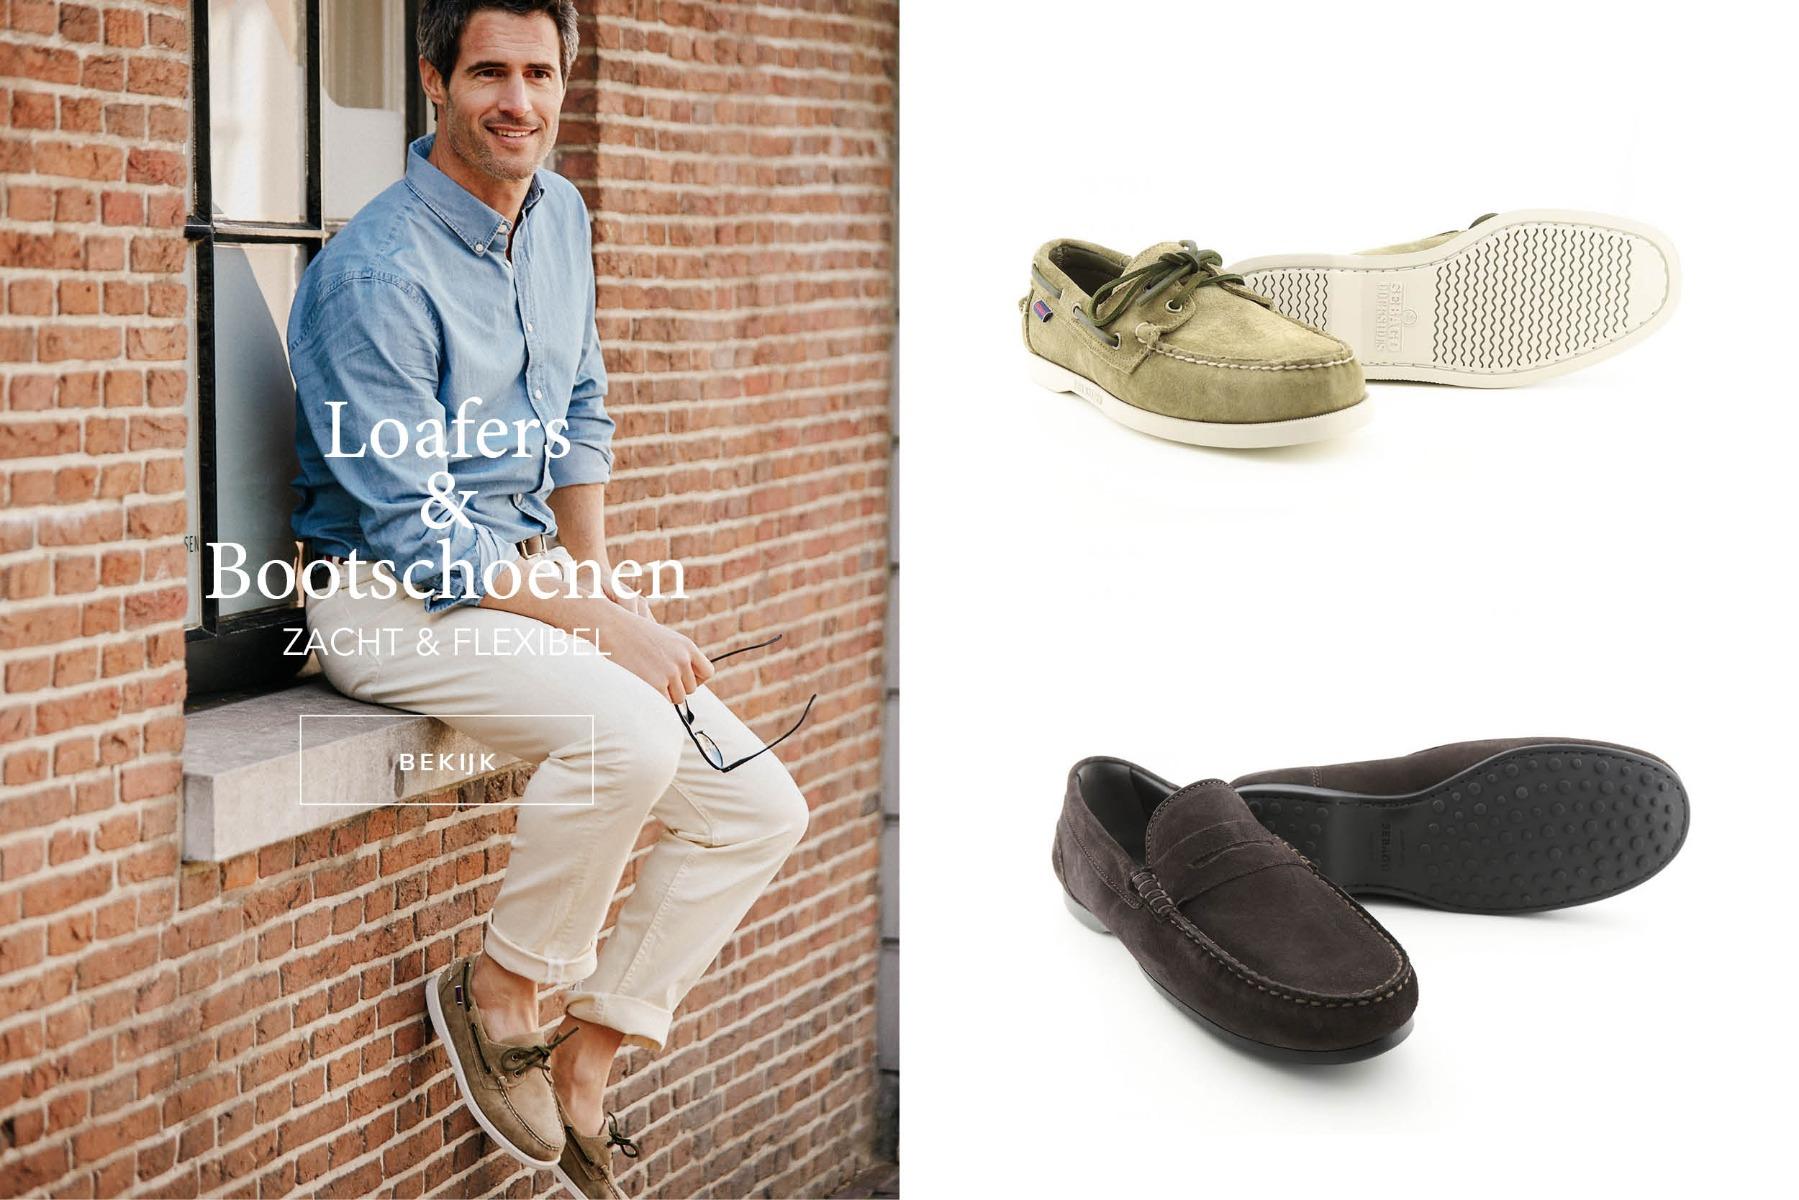 Loafers en bootschoenen